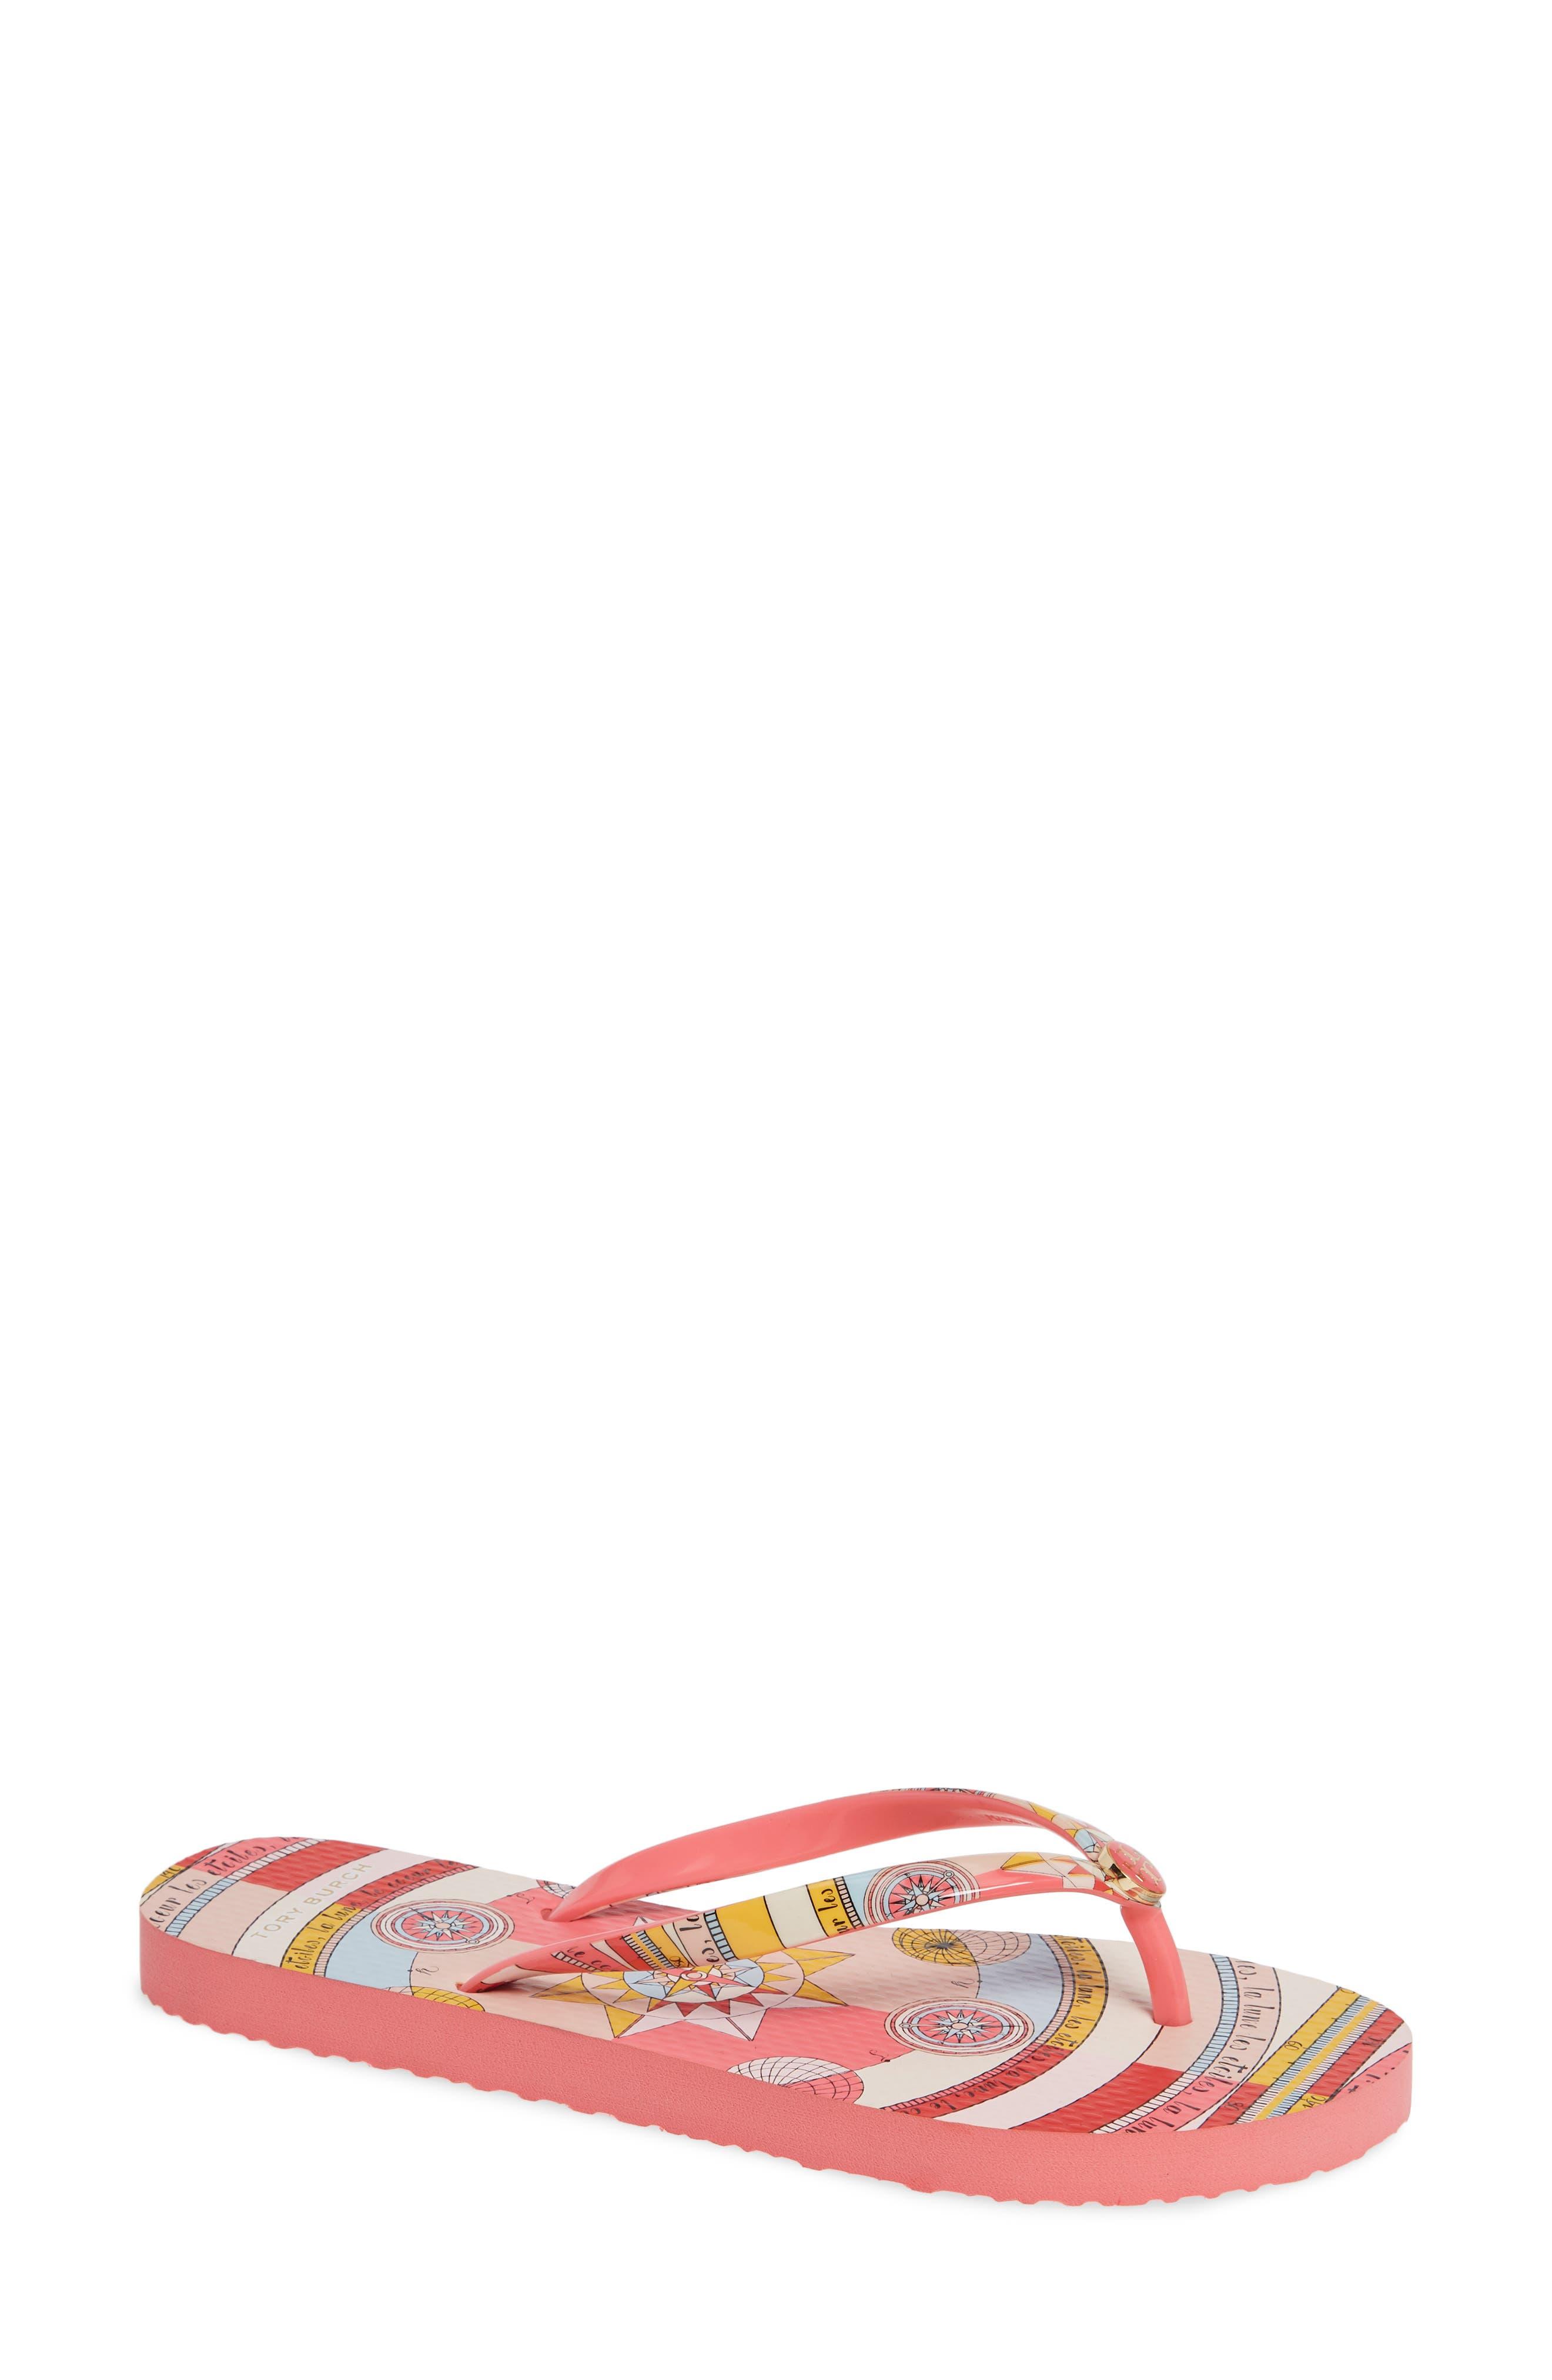 b594cc4ebf8b Tory Burch Flip-Flops   Sandals for Women